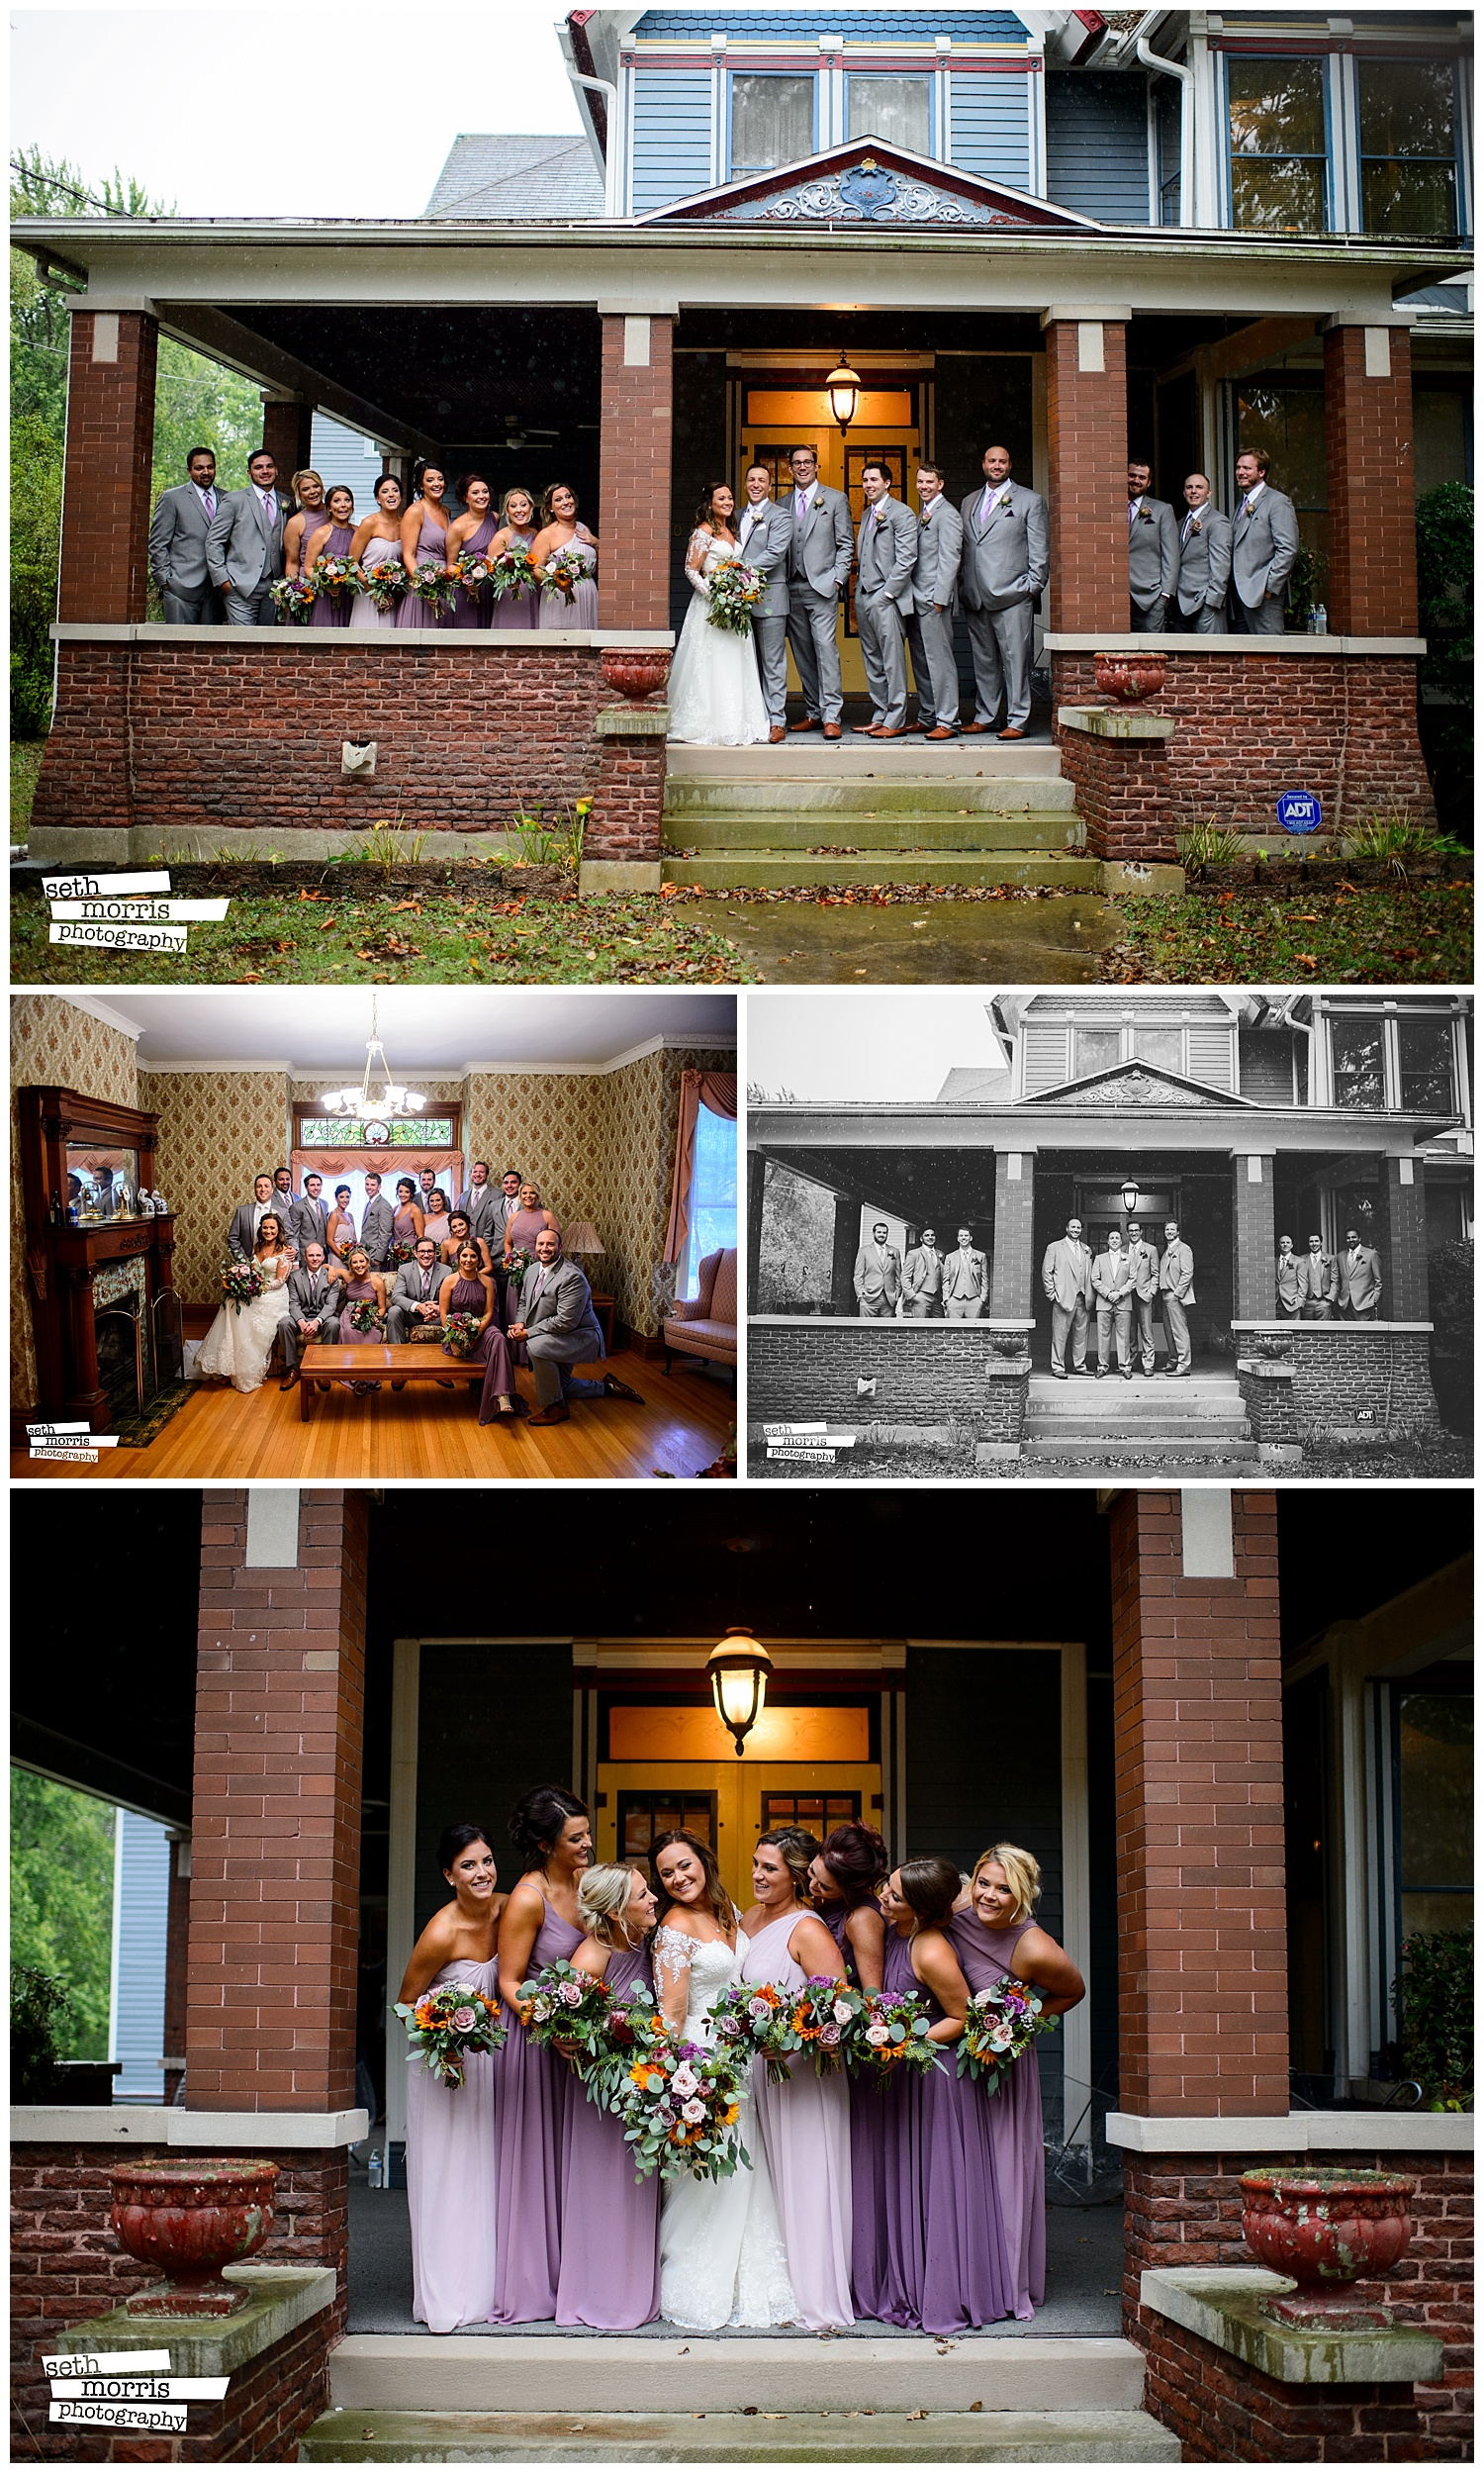 ottawa-tent-wedding-reception-rainy wedding-pictures-43.jpg